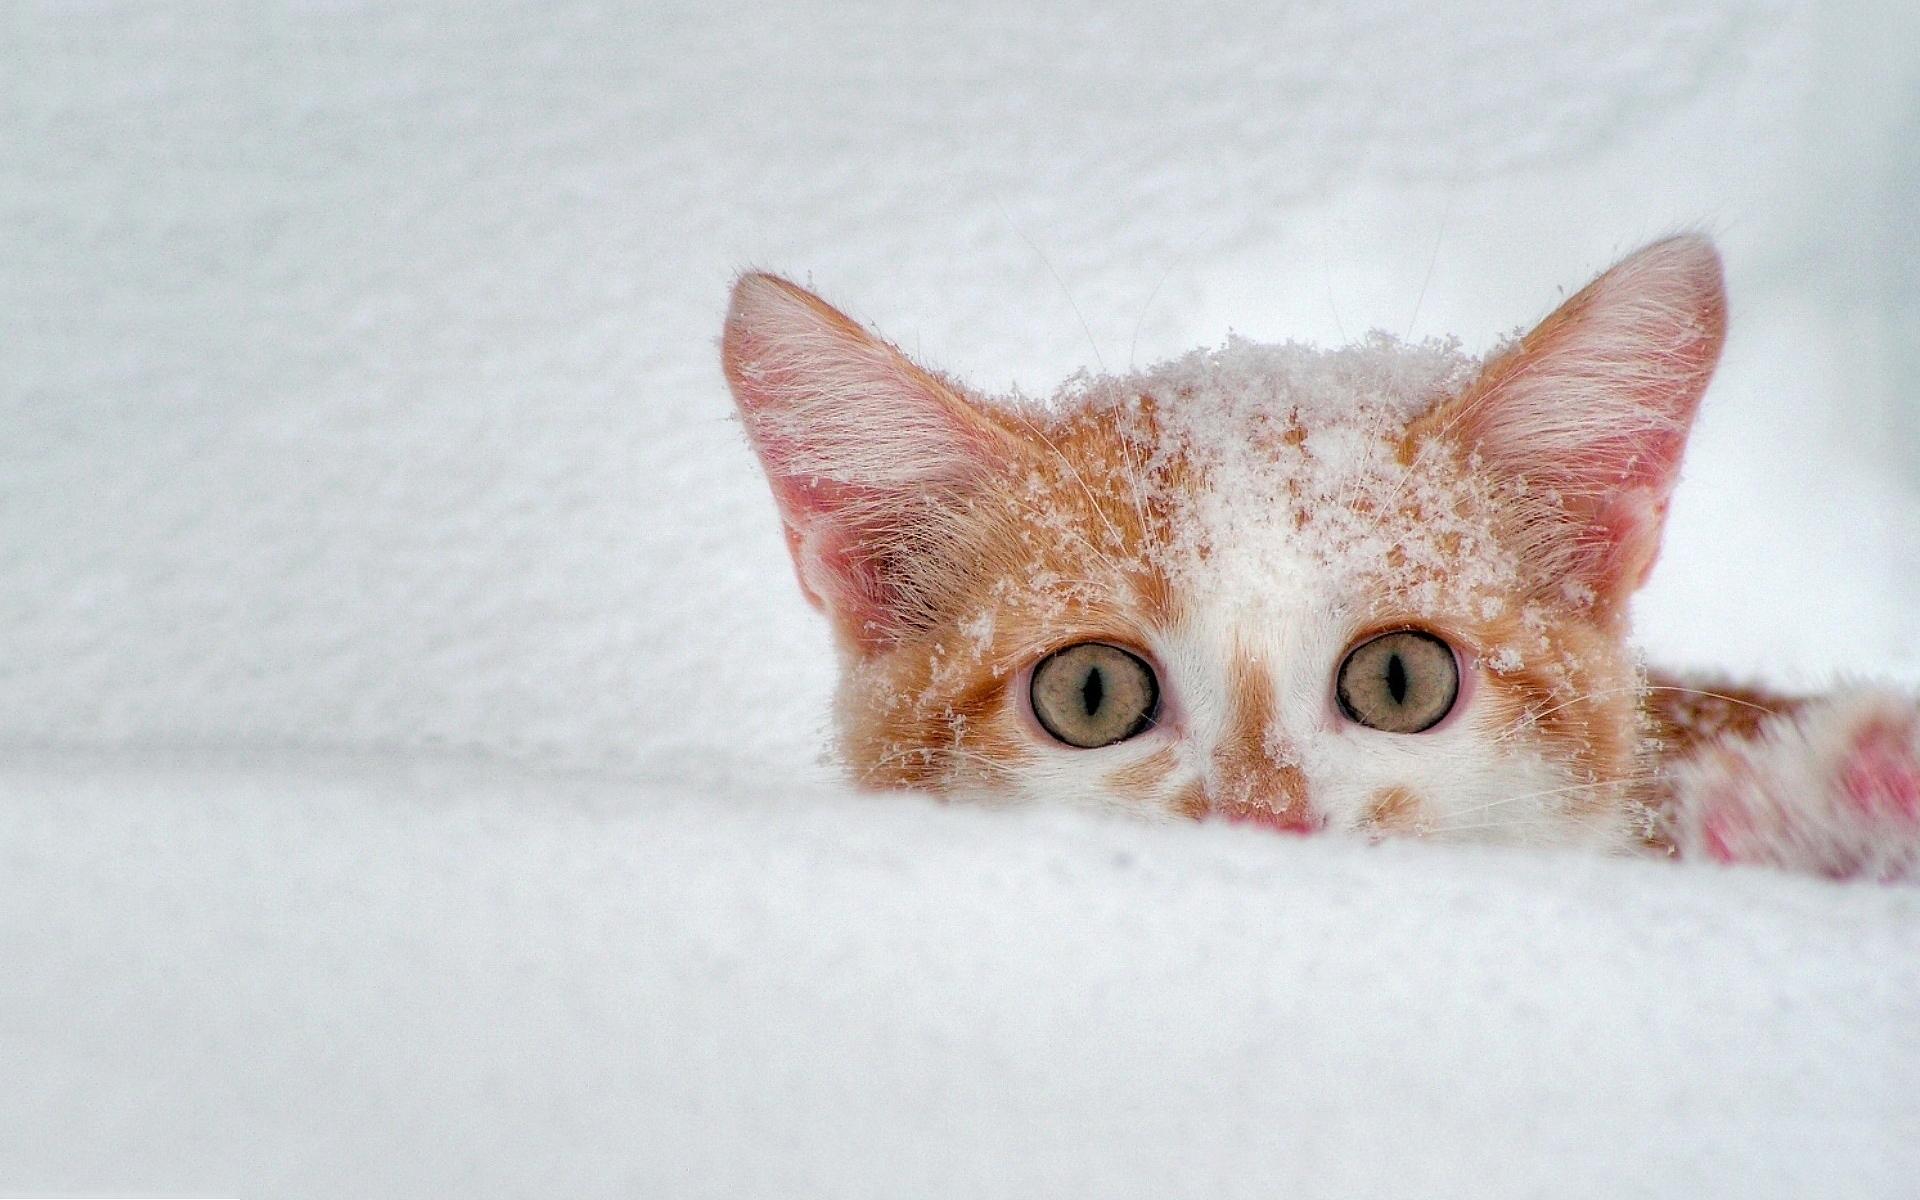 Cat Snow Scary